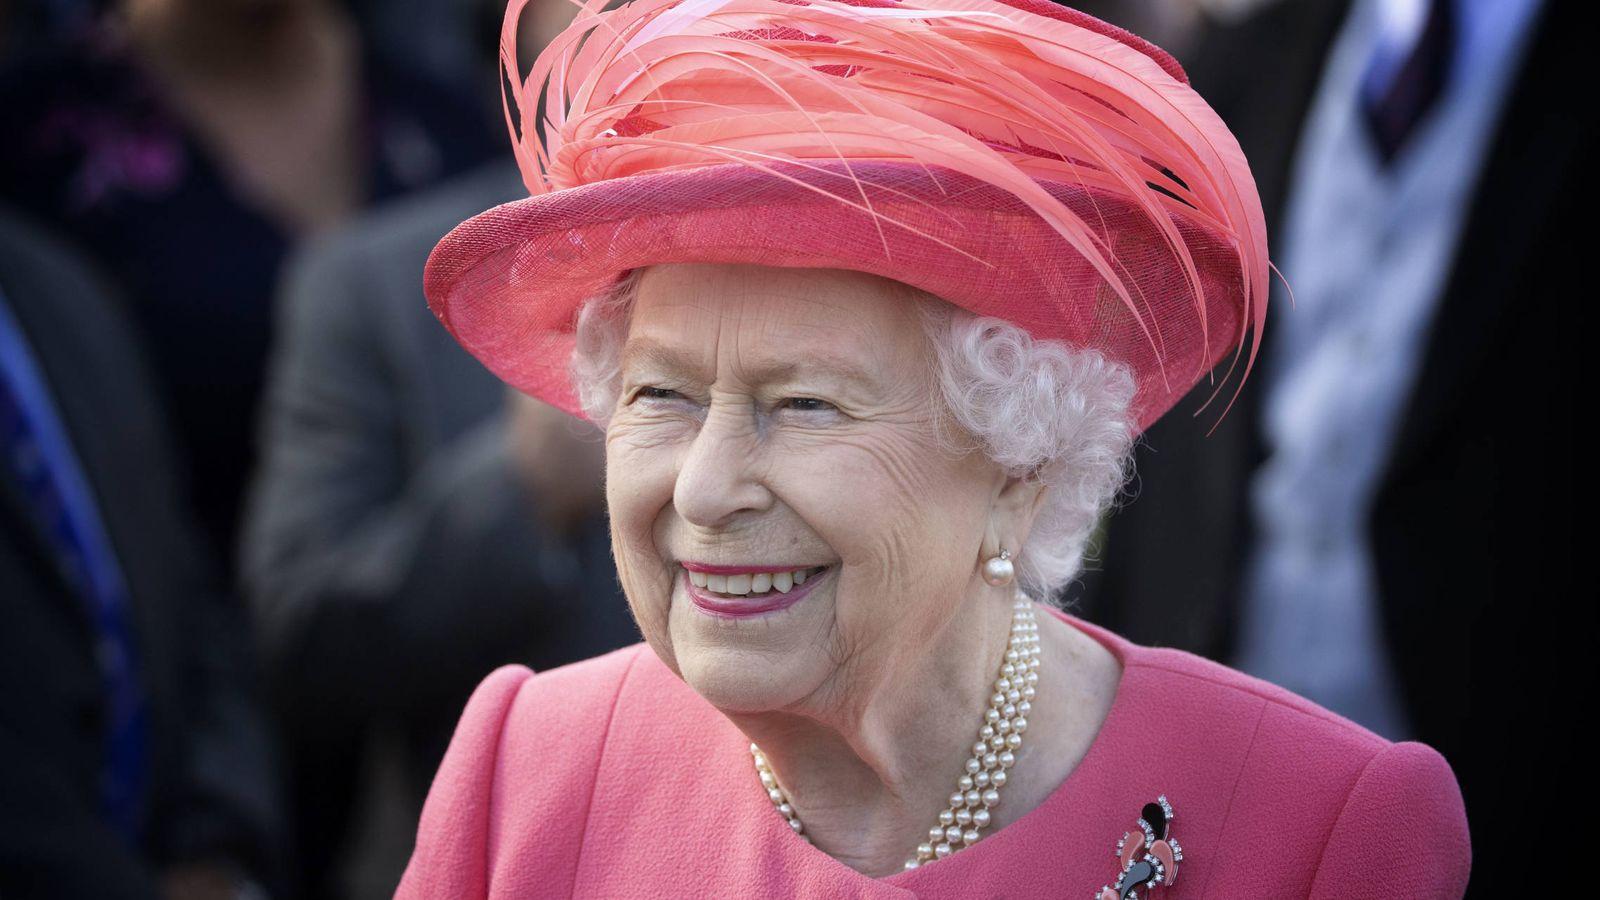 Foto: La reina Isabel II, en una imagen de archivo. (Getty)